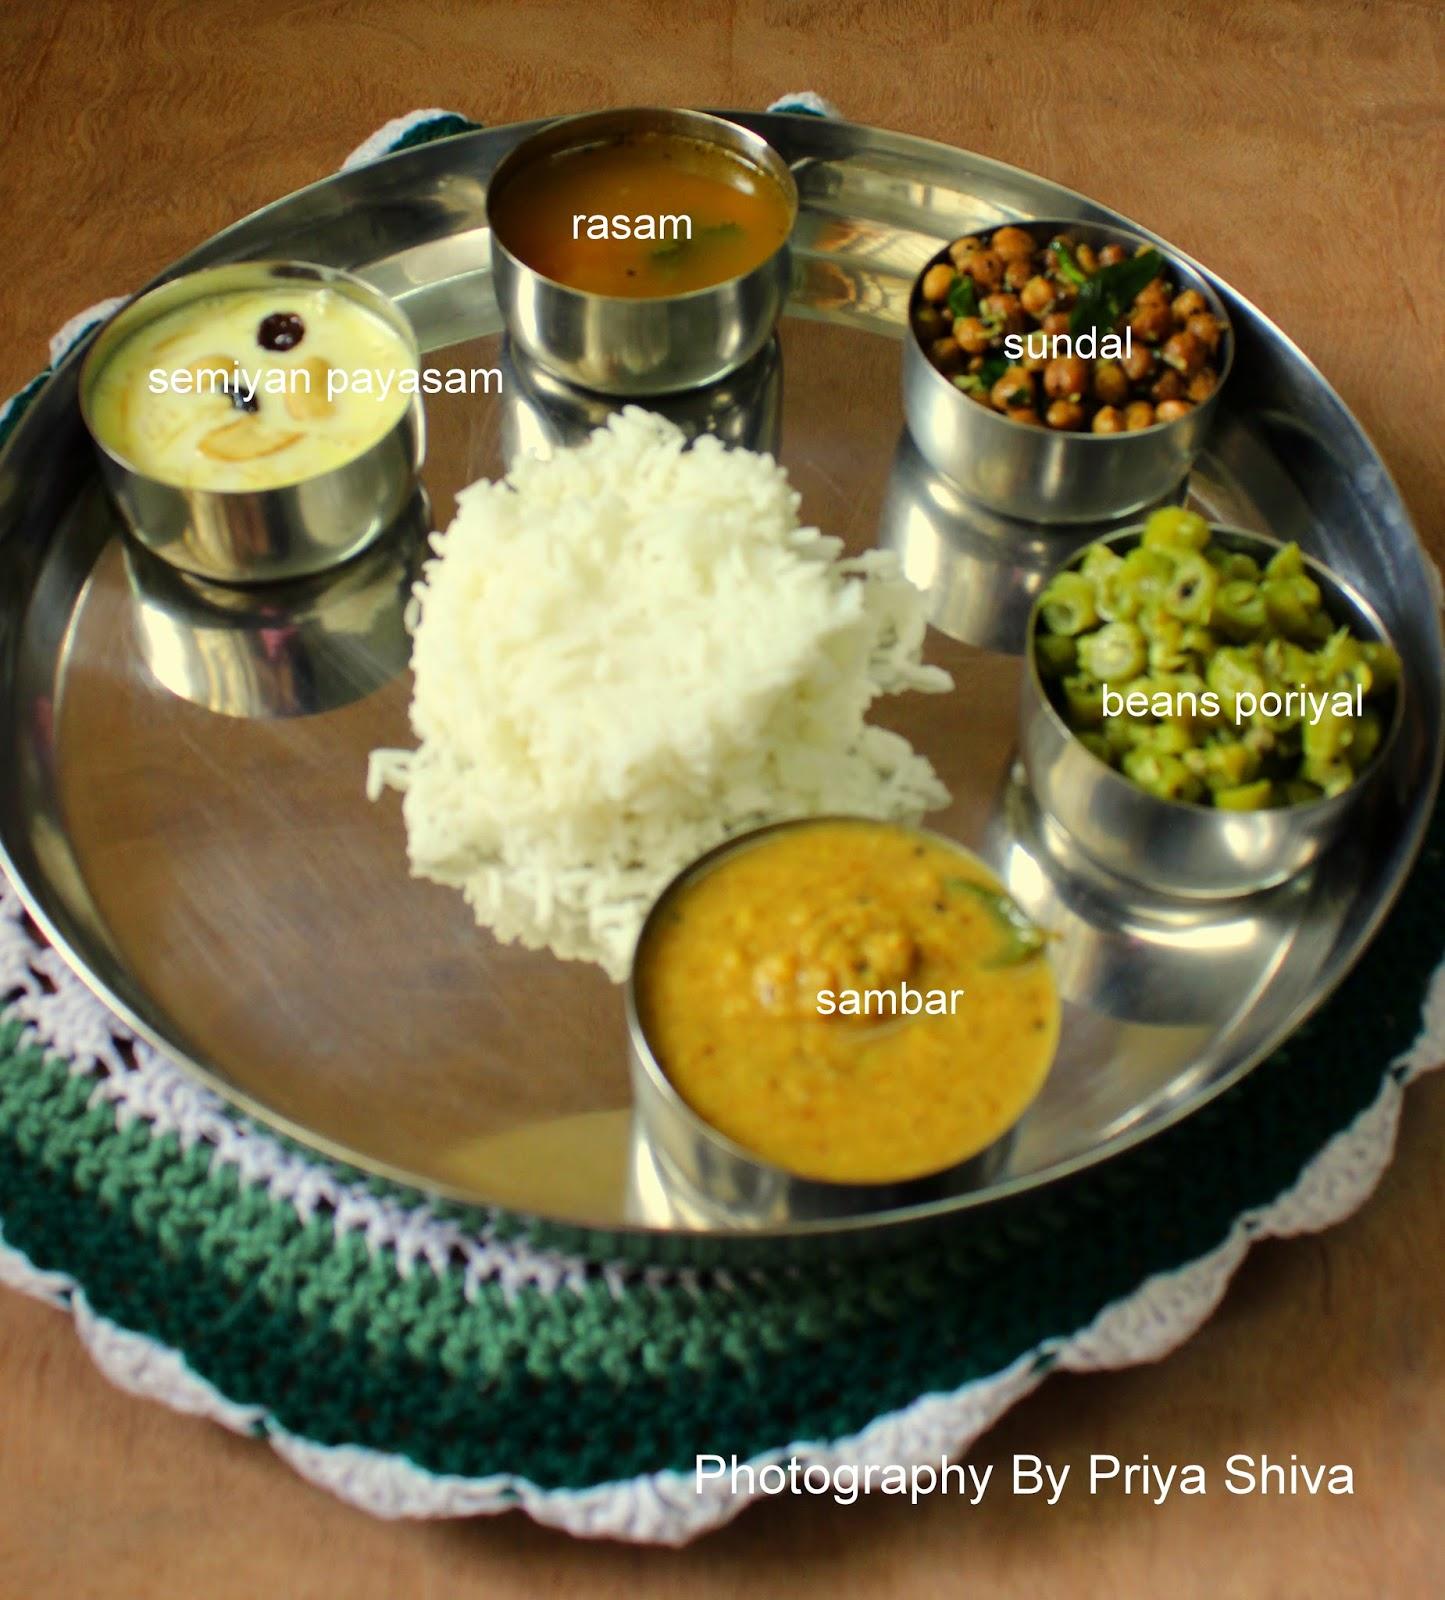 lunch planning, dinner menu, recipes, vegetarian thali